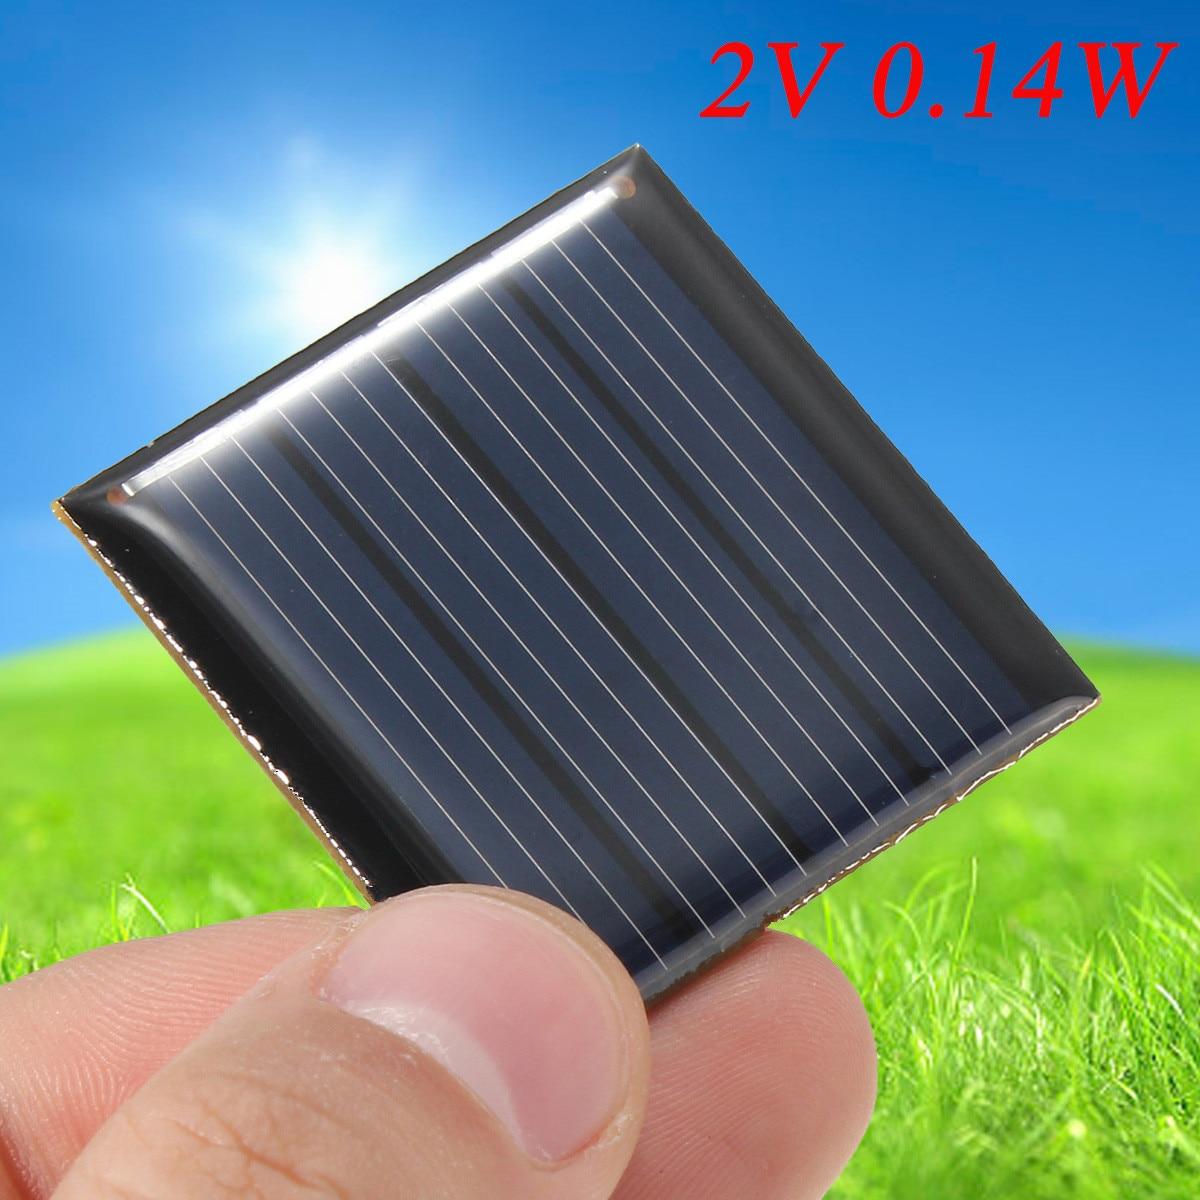 KINCO Solar Panel Kit 2V 0.14W 70mA Solar Charger Mini DIY 1.2V Battery Charger Module Epoxy PV Polycrystalline Cells 40*40*3mm